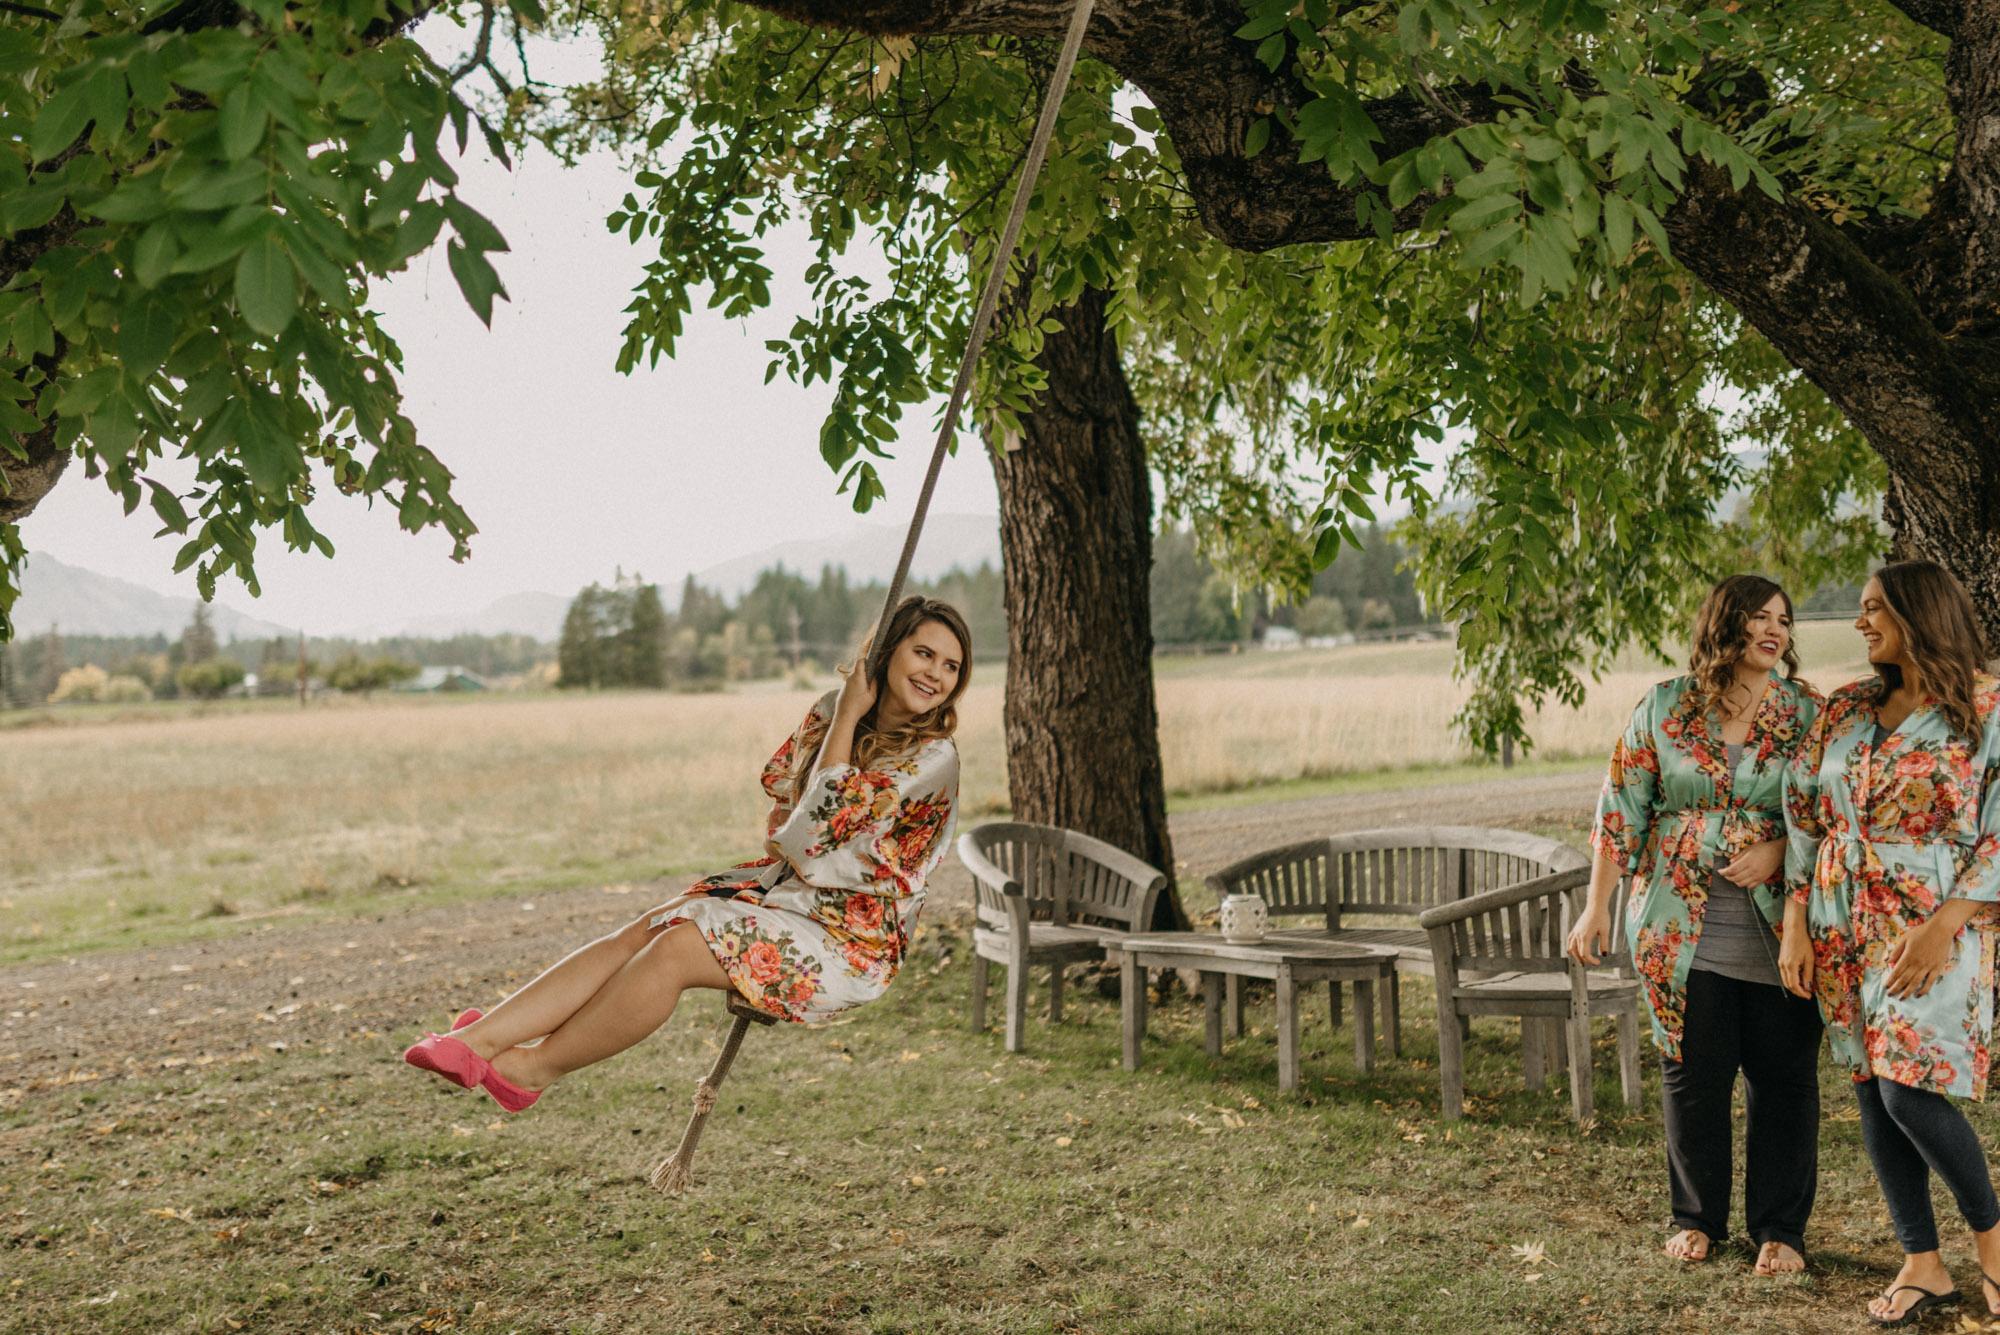 Getting-Ready-Swingset-Washington-Wedding-ringshot-7897.jpg